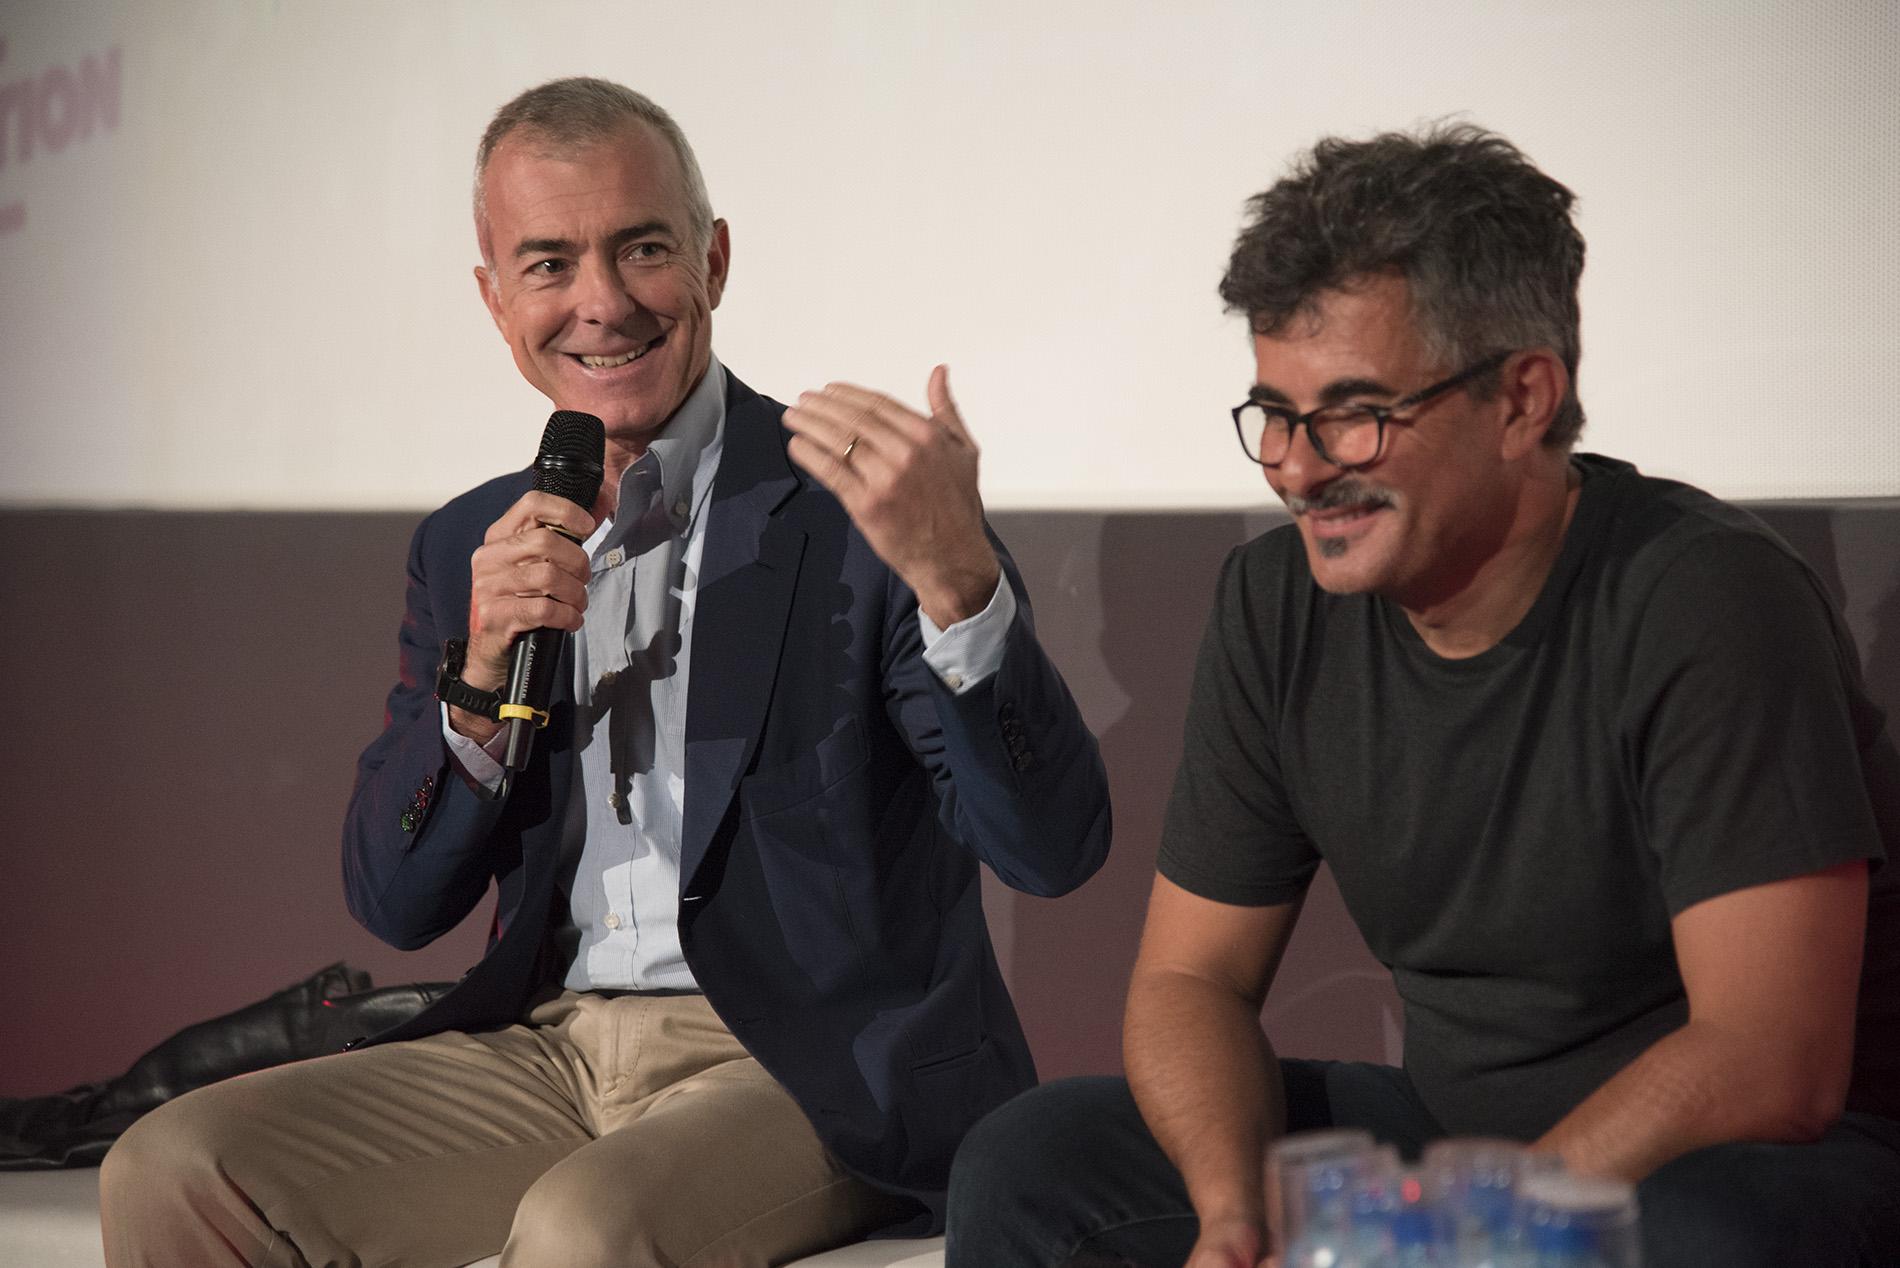 Giampaolo Letta, Paolo Genovese